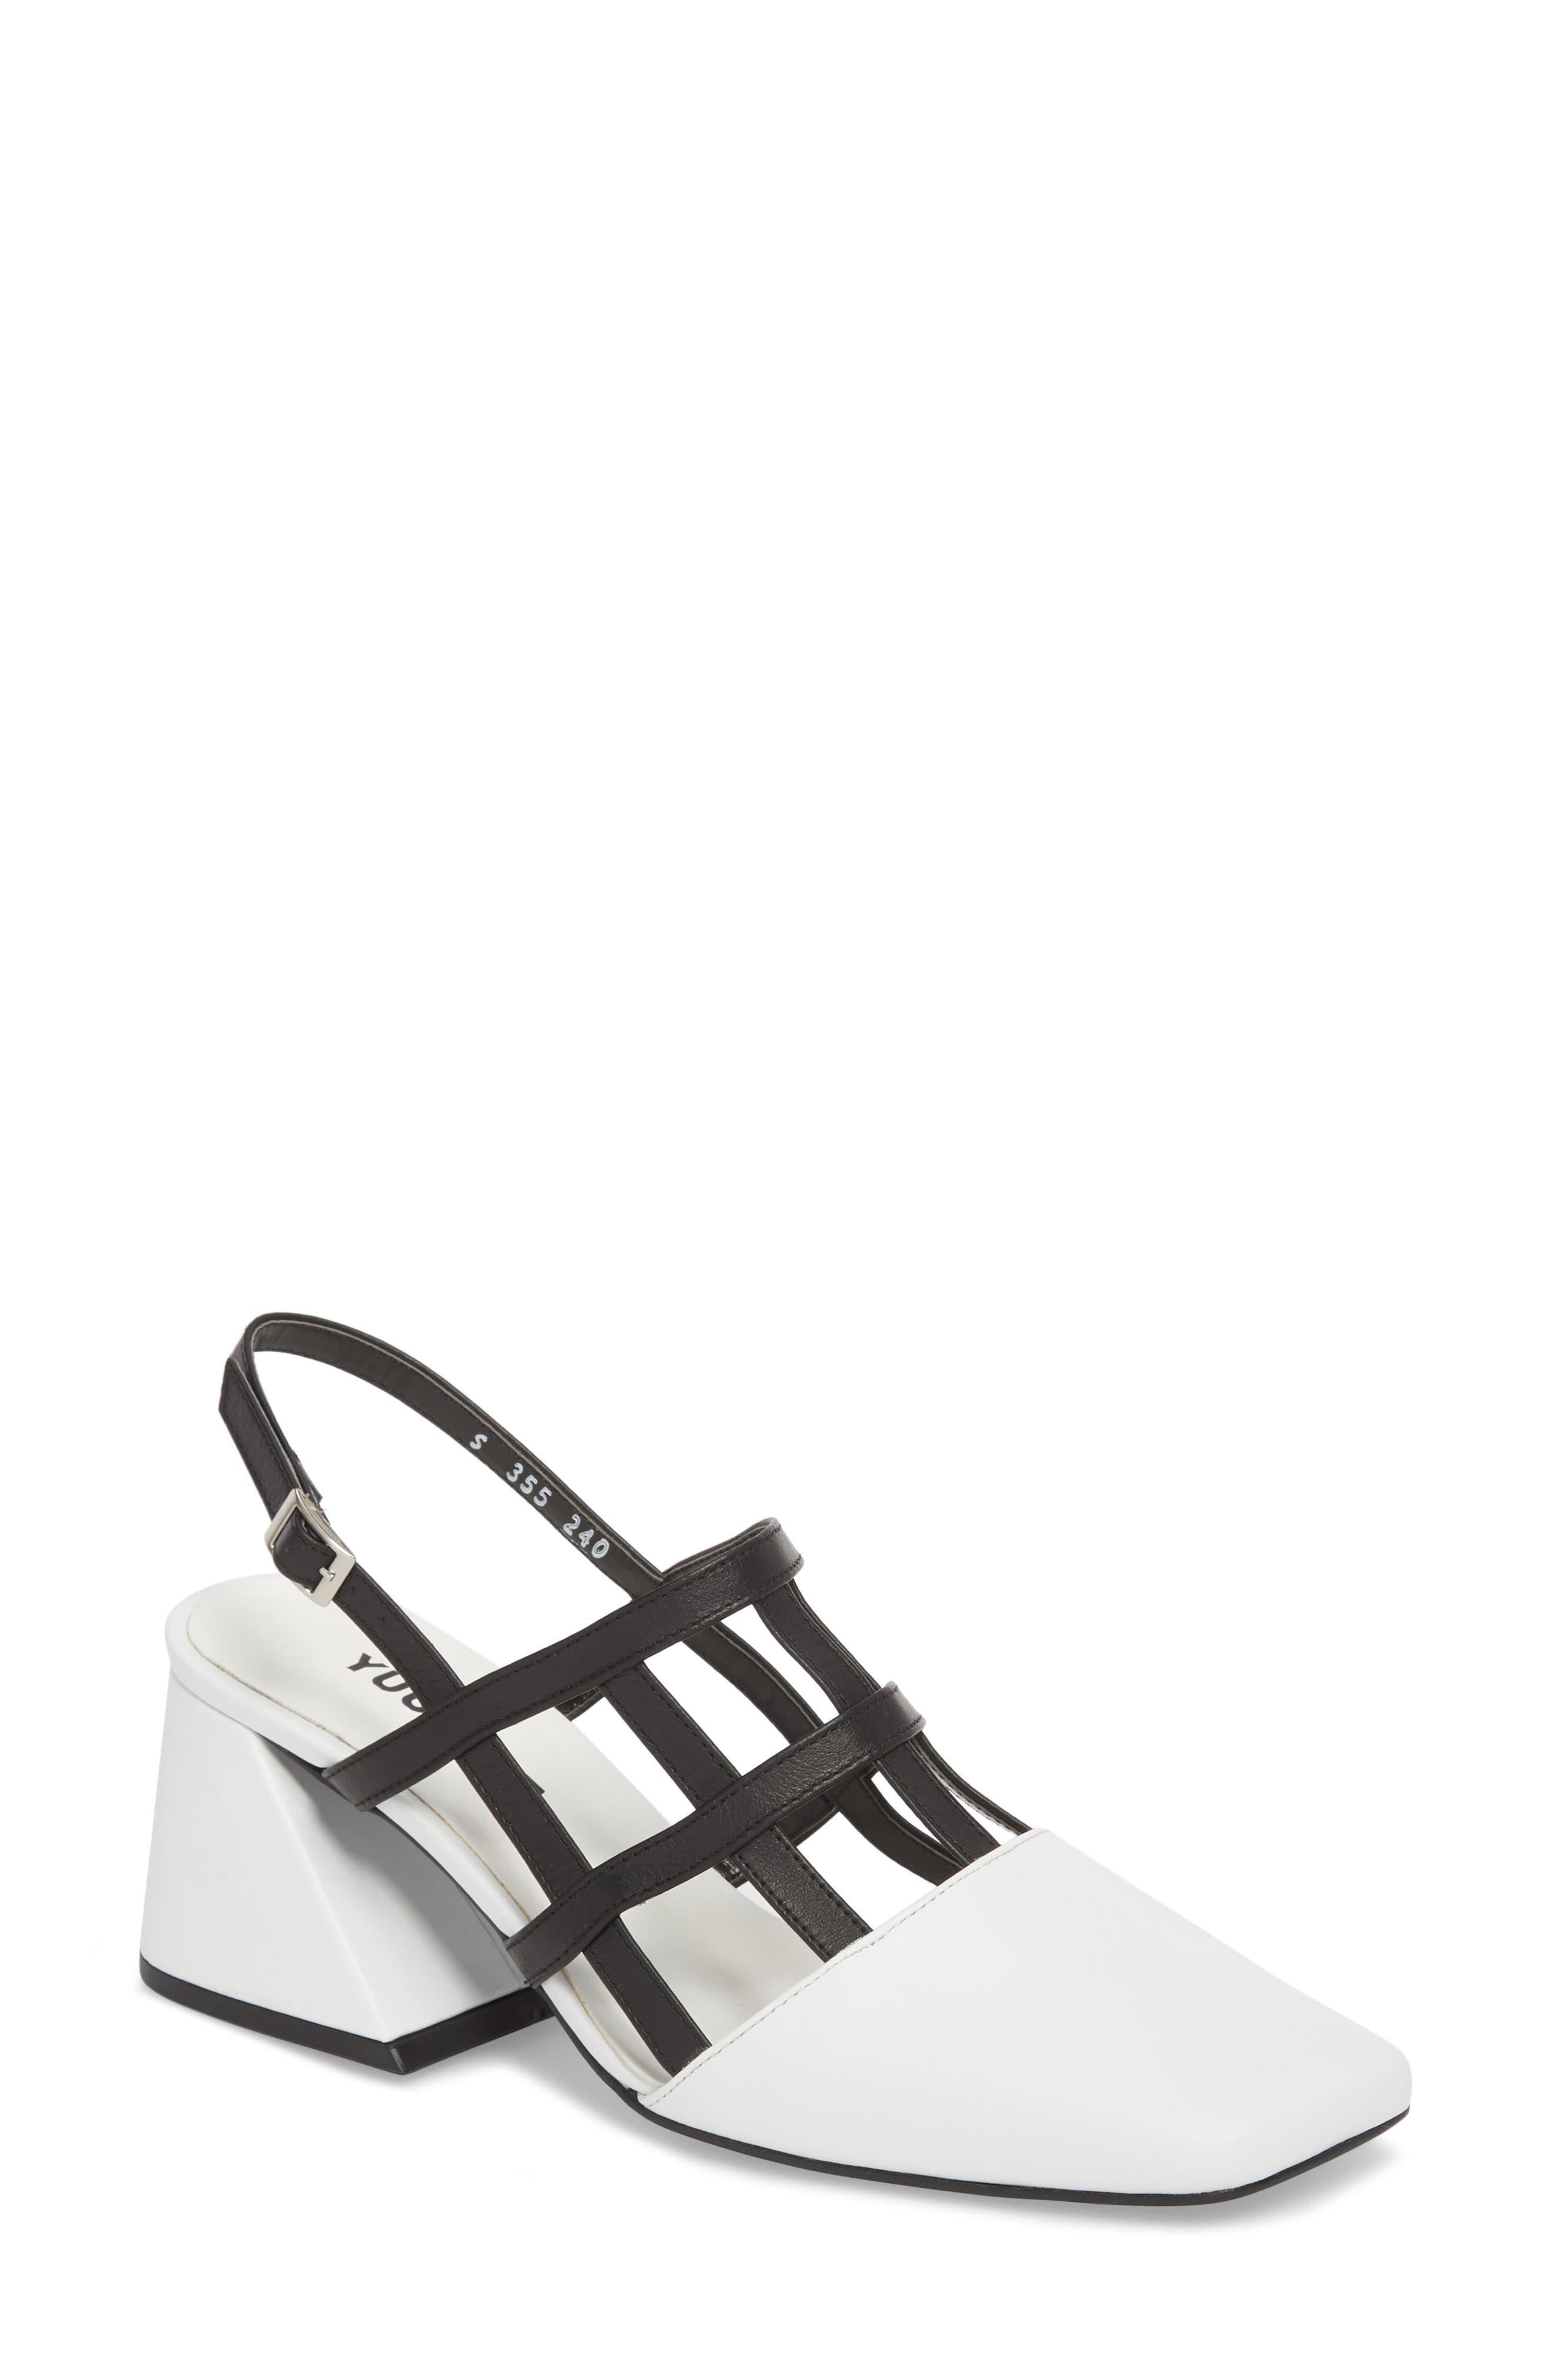 Caged Slingback Pump,                         Main,                         color, White/ Black